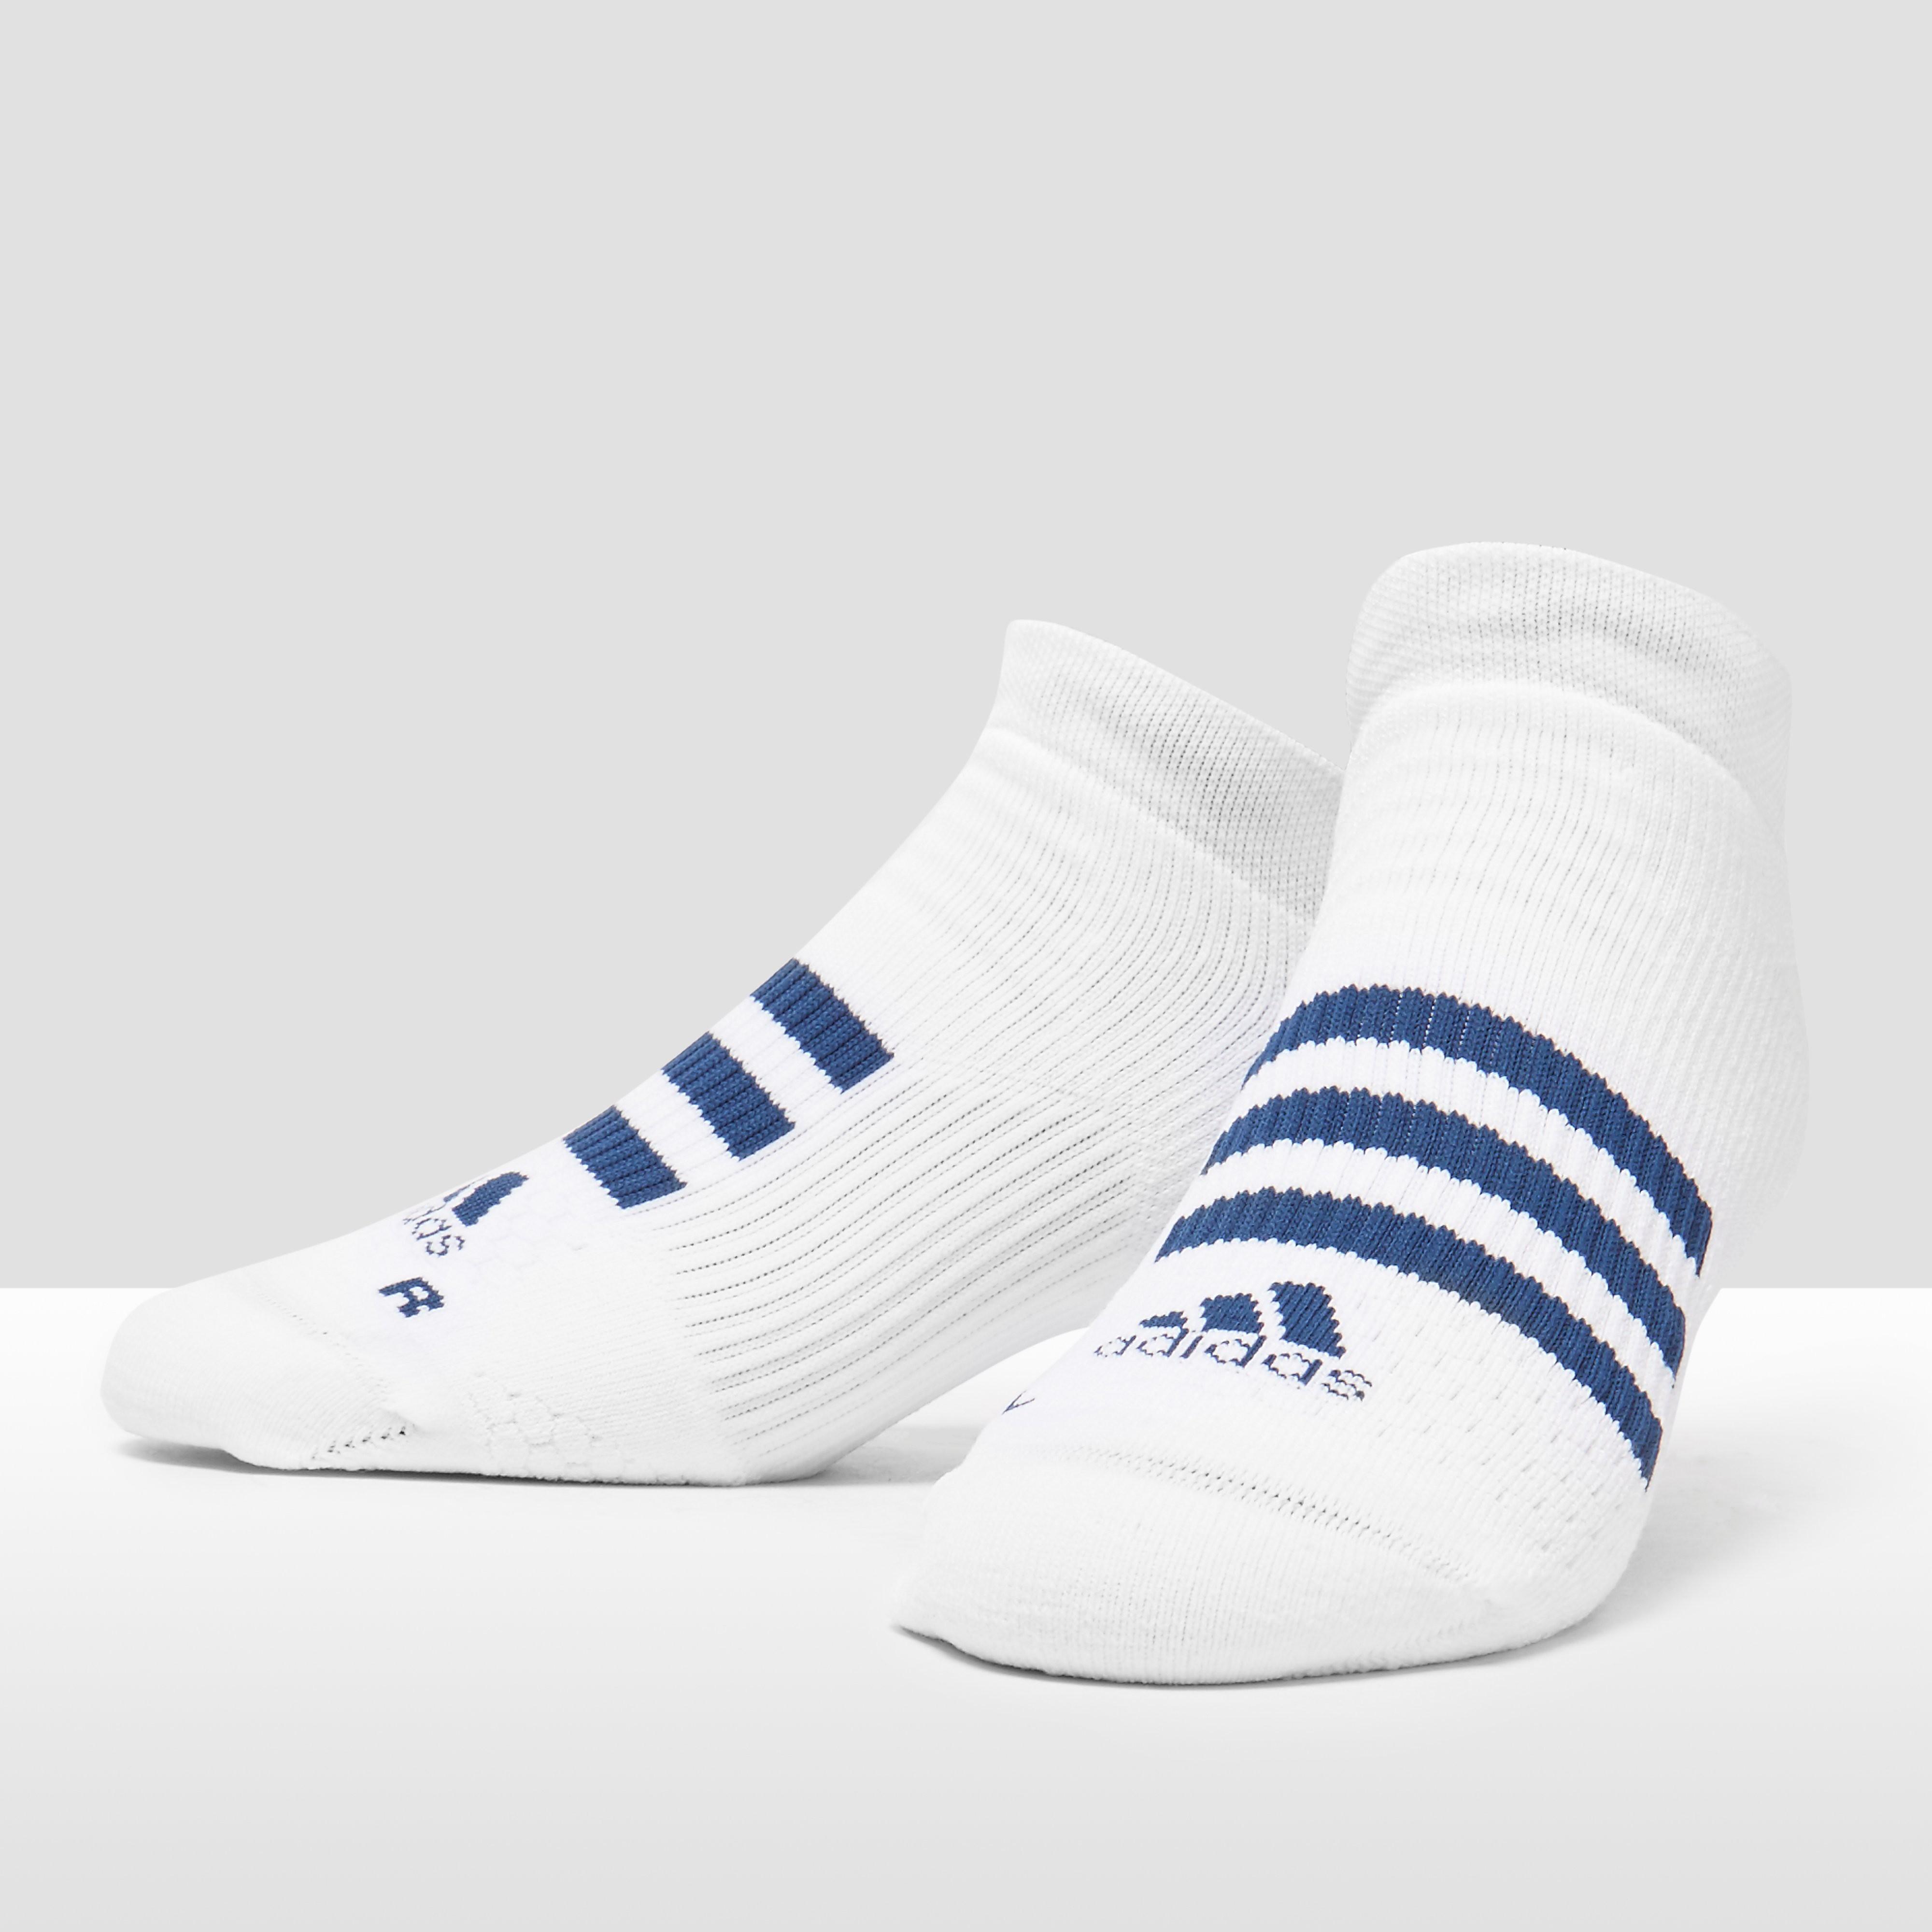 adidas Tennis Liner Tennis Ankle Socks